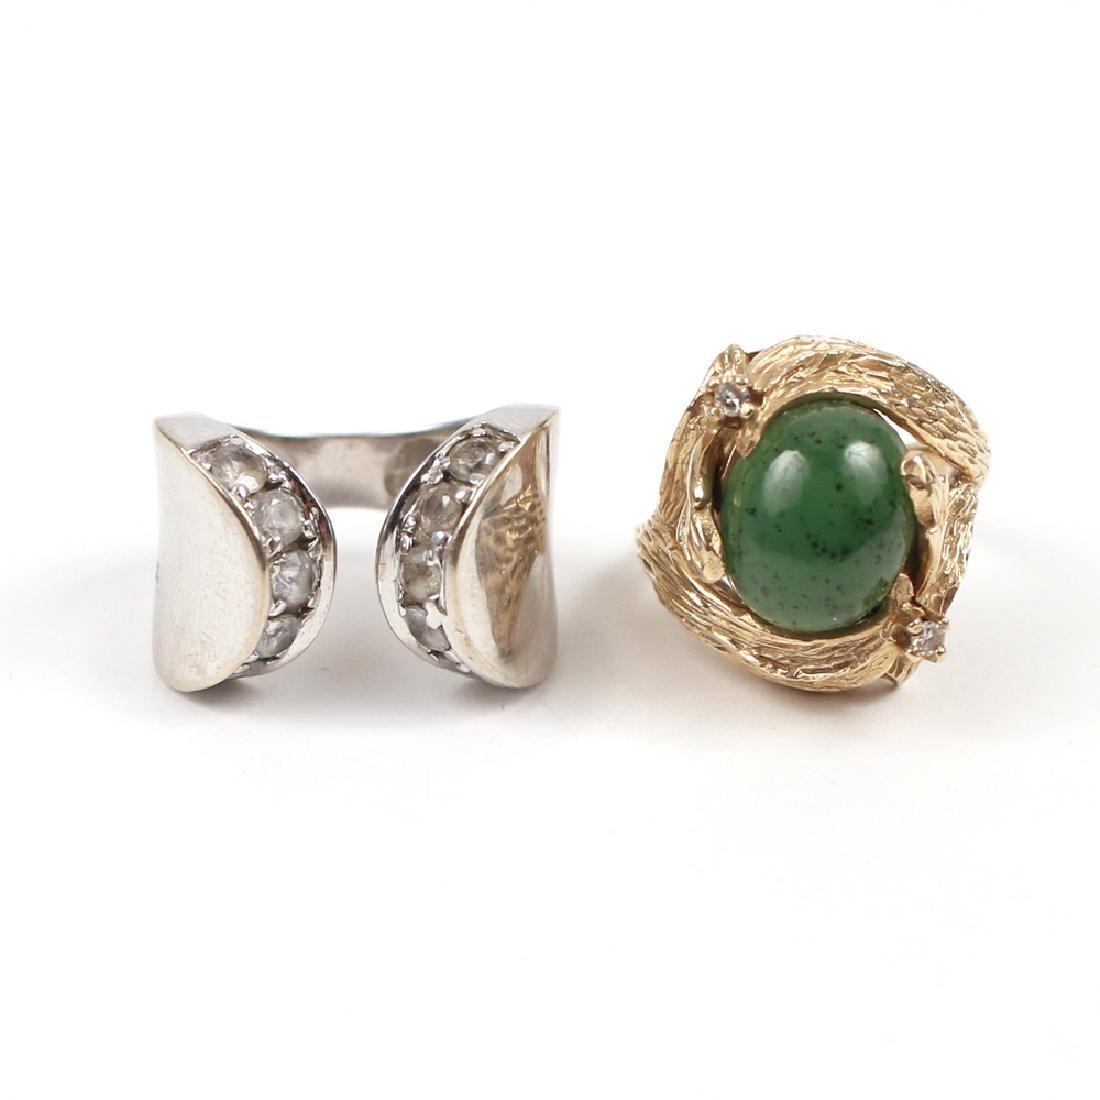 (2pc) GEMSTONE & GOLD RINGS